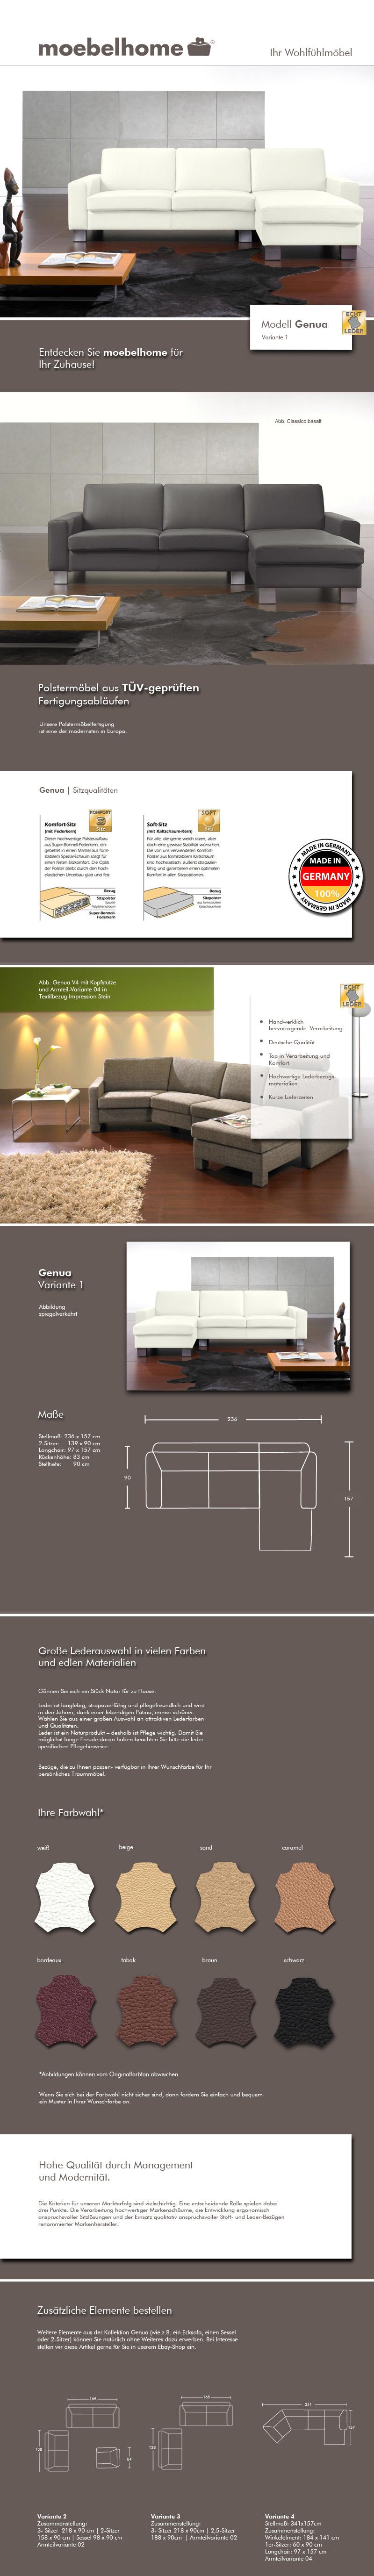 Leder sofa garnitur couch ecksofa wohnlandschaft eckcouch for Ledersofa ebay